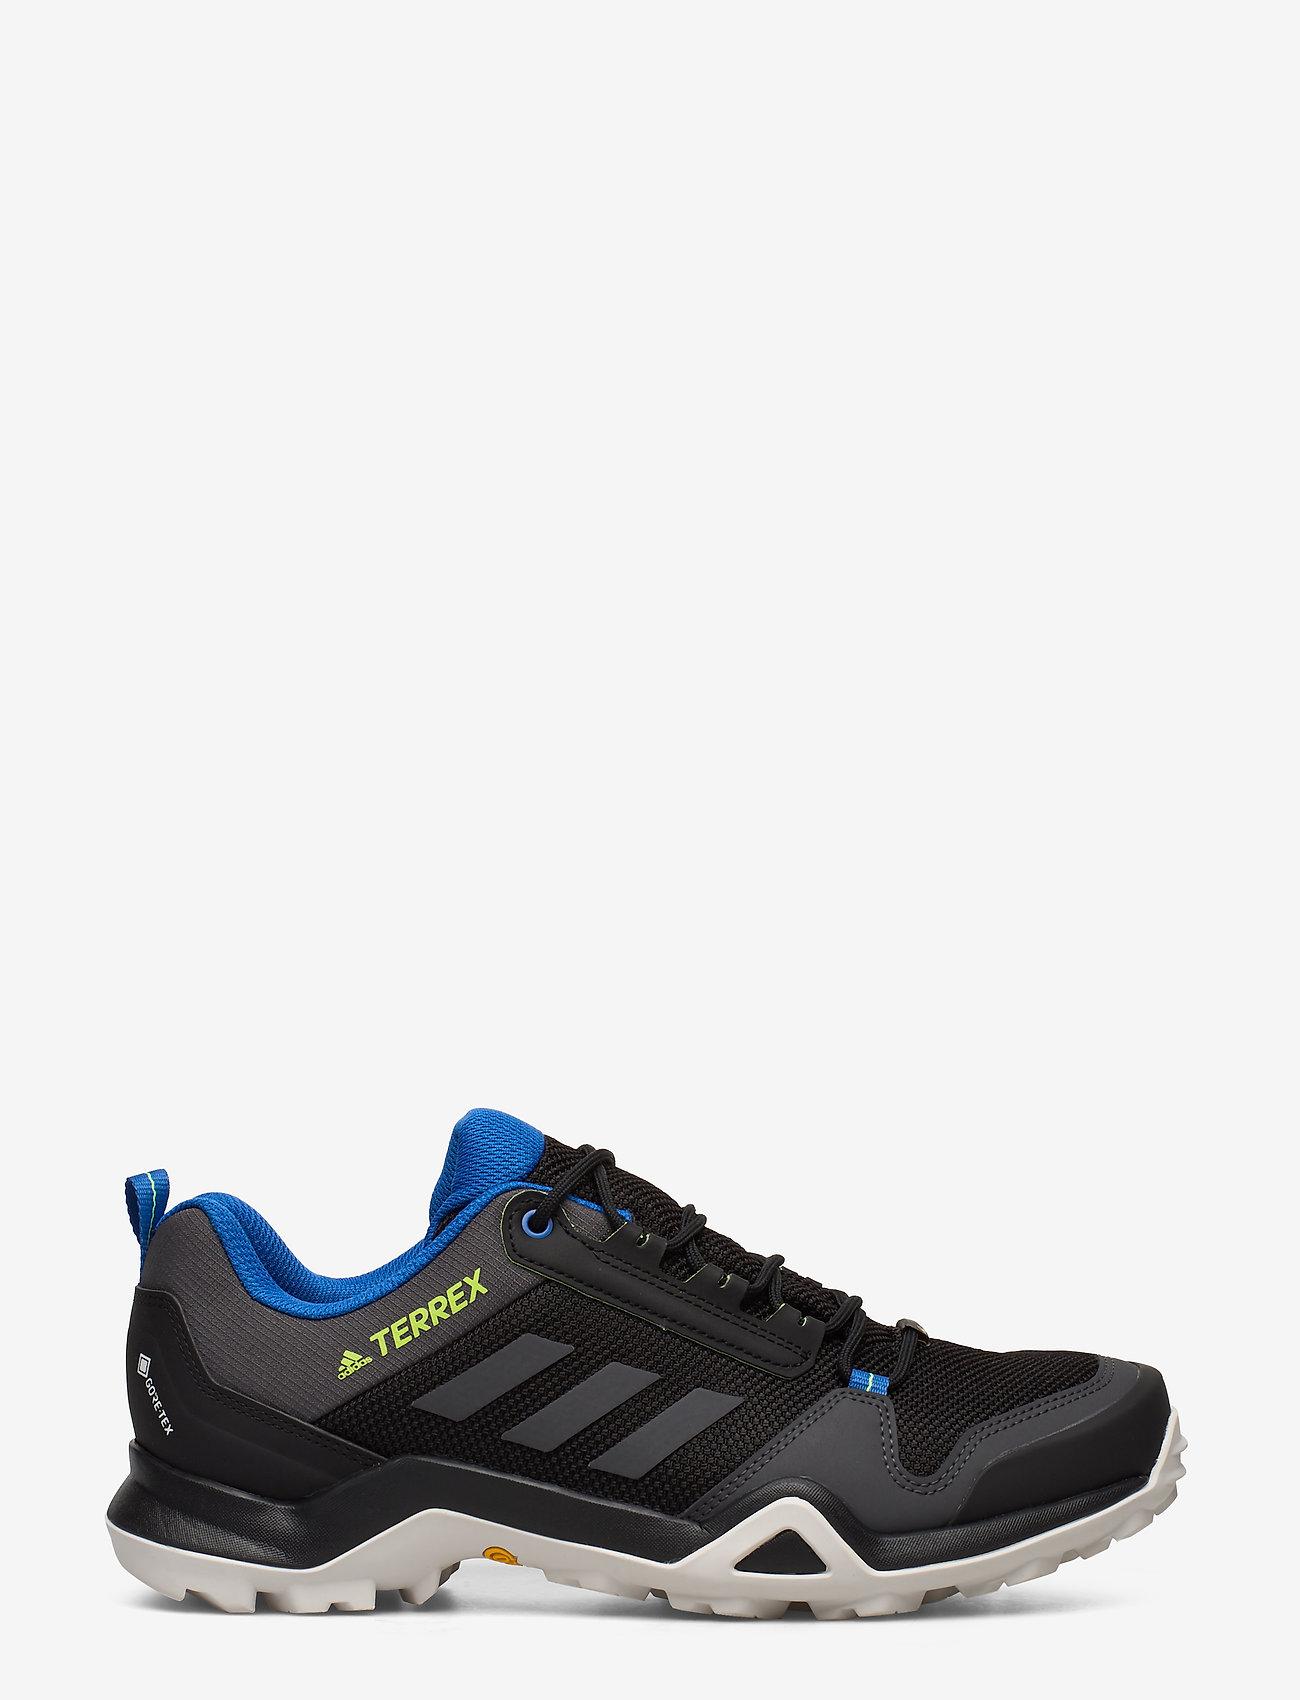 Terrex Ax3 Gtx (Cblack/dgsogr/siggnr) (95.96 €) - adidas Performance uhVWV